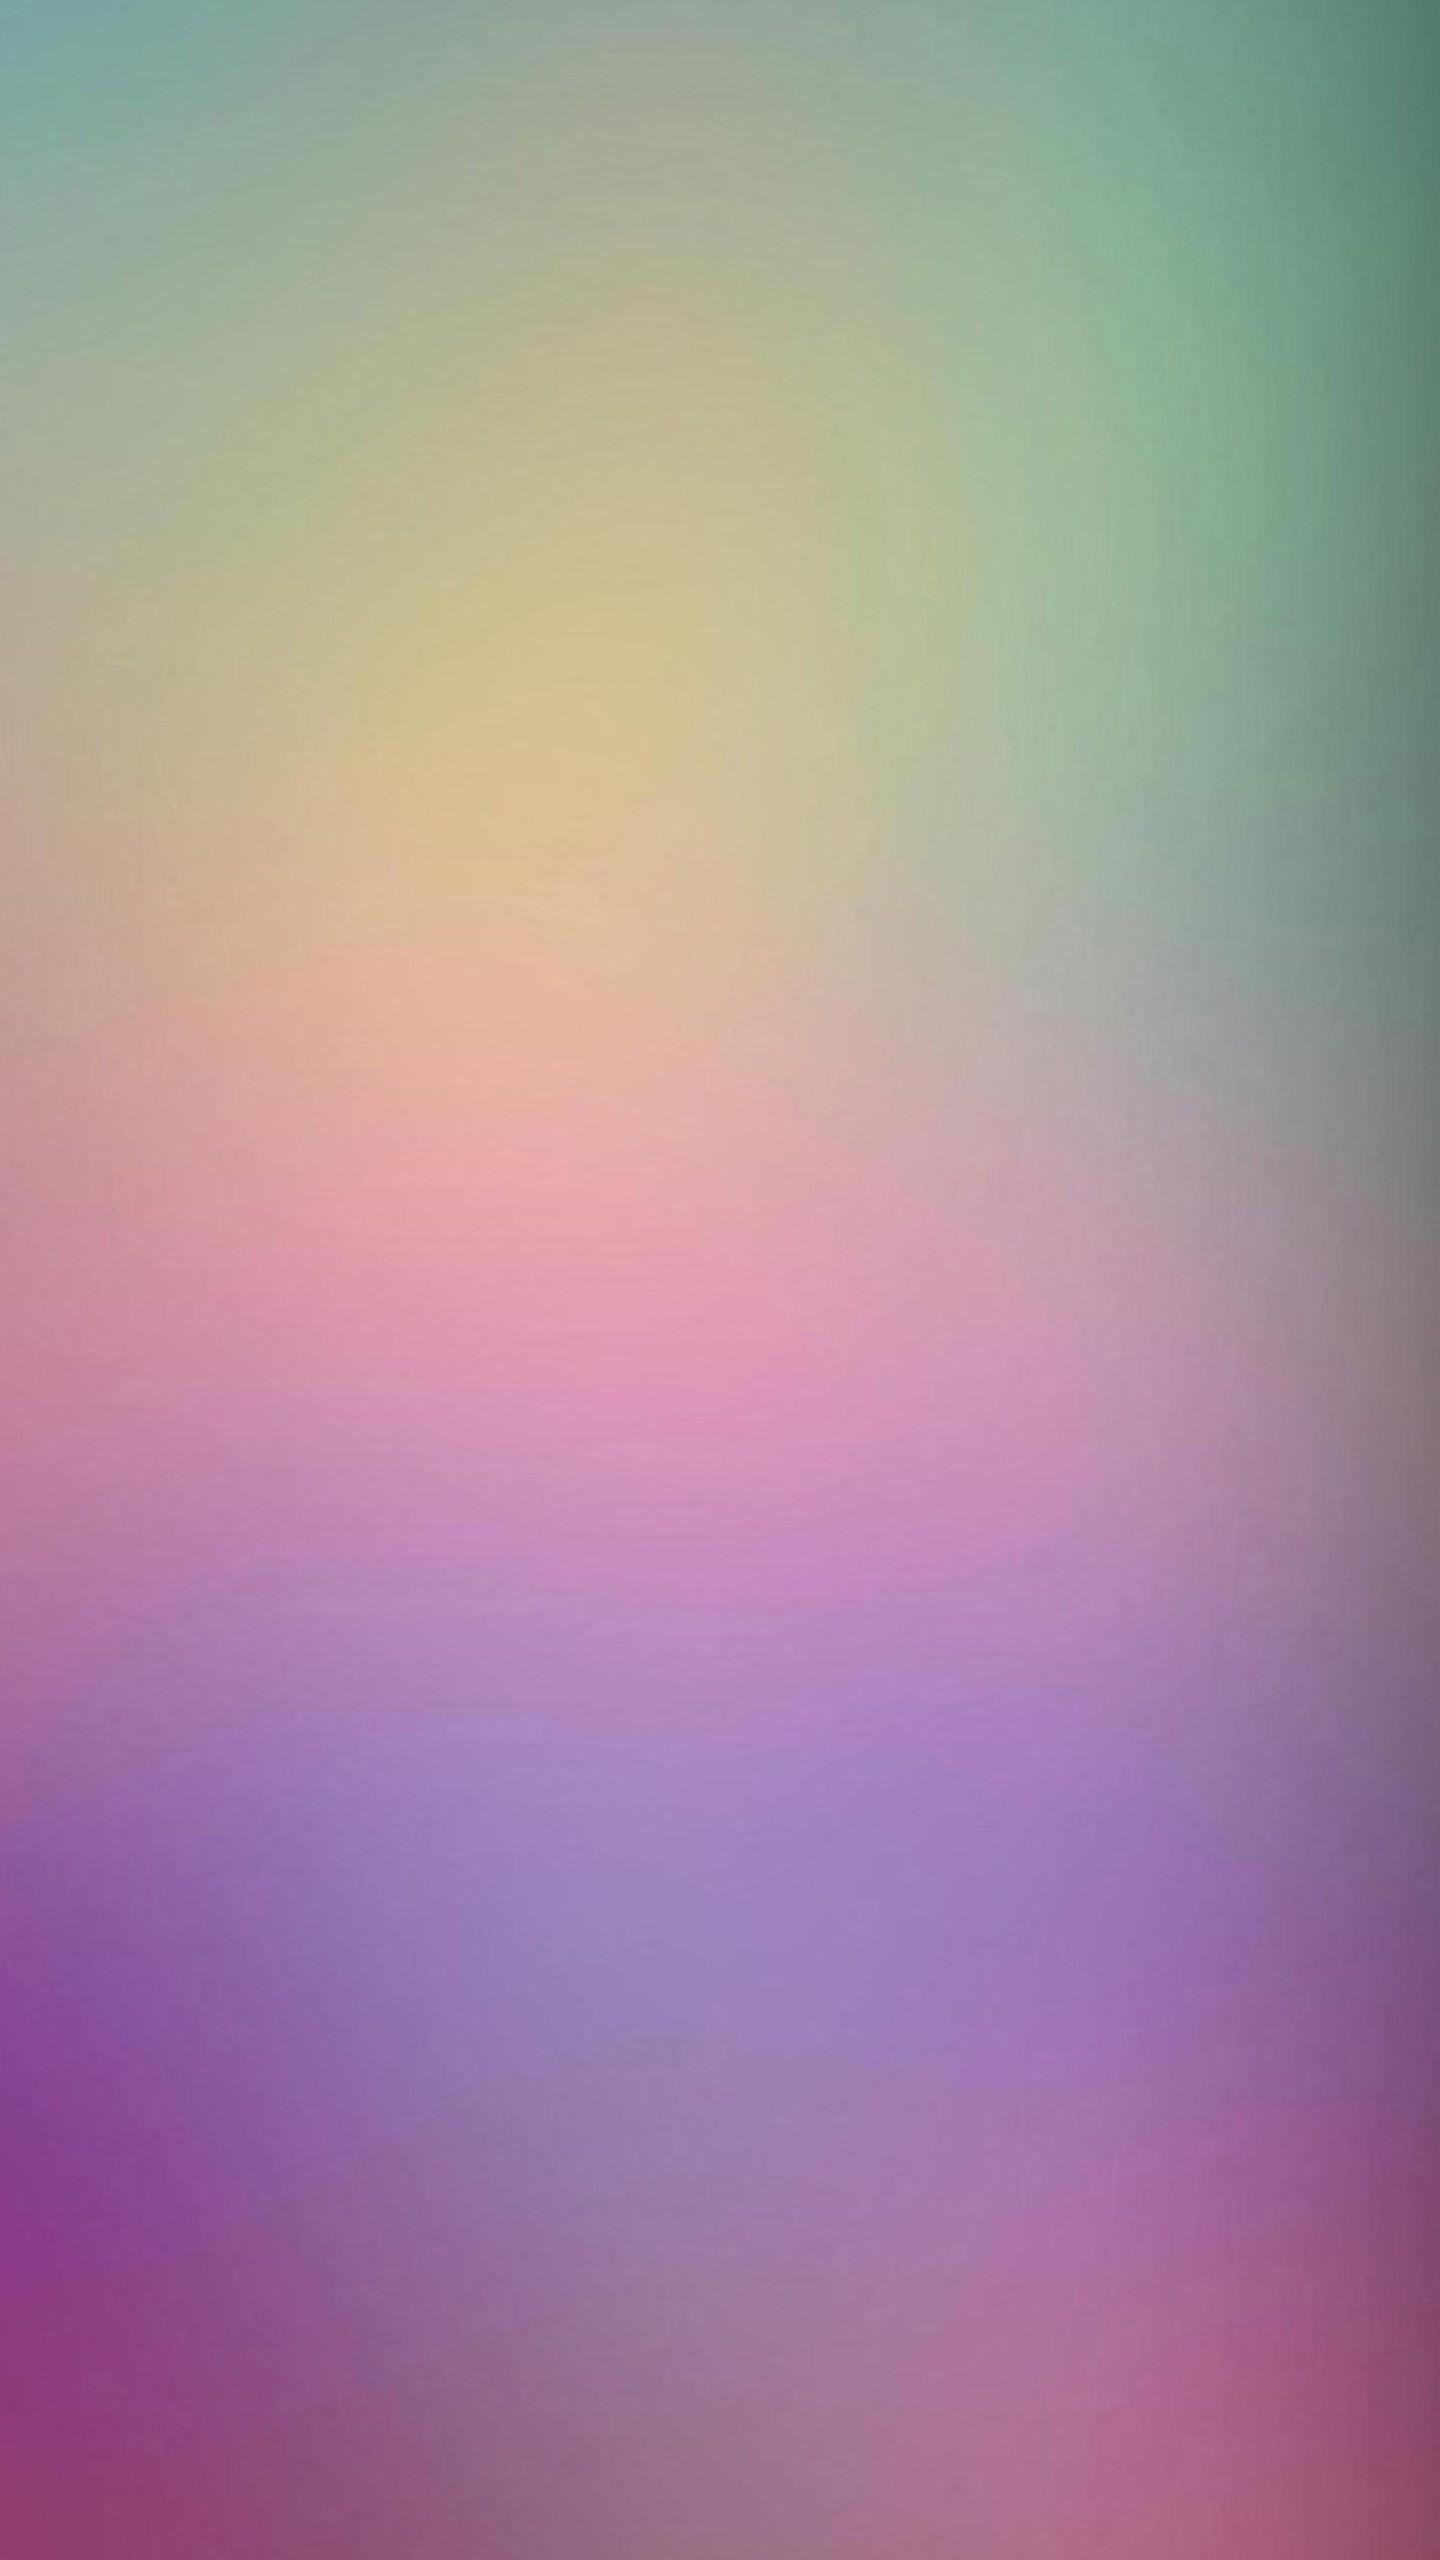 Wood Iphone 6 Wallpaper 41 Gradient Backgrounds 183 ① Download Free Beautiful Full